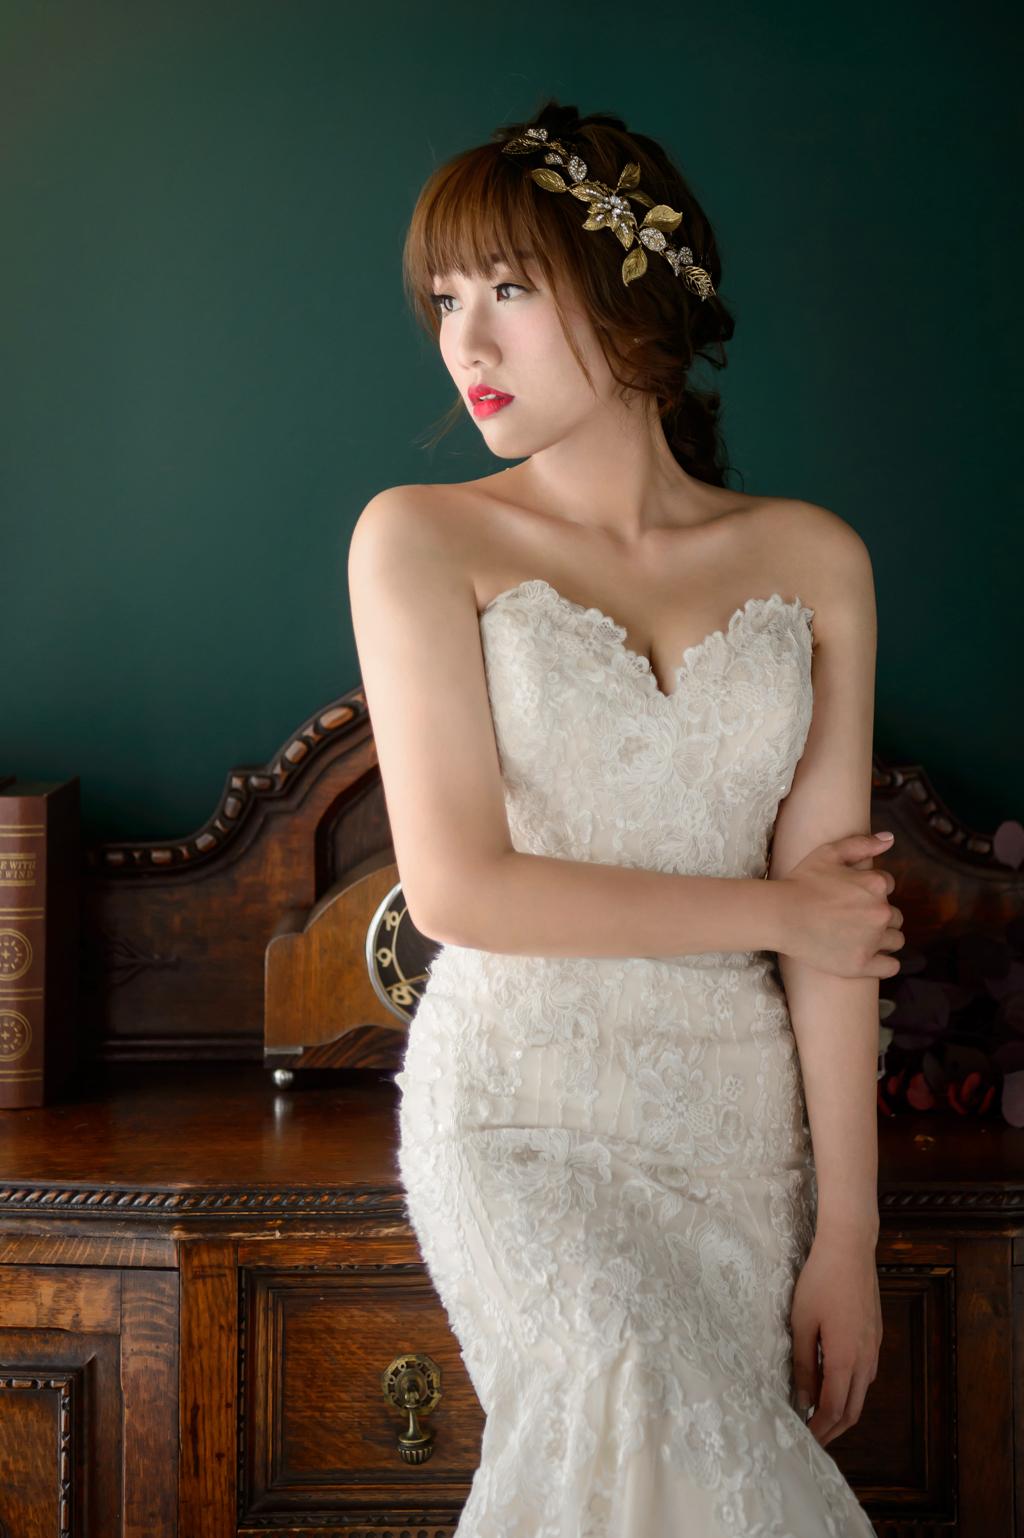 婚攝小勇, 小寶團隊, 自助婚紗, niniko, wedding day-005